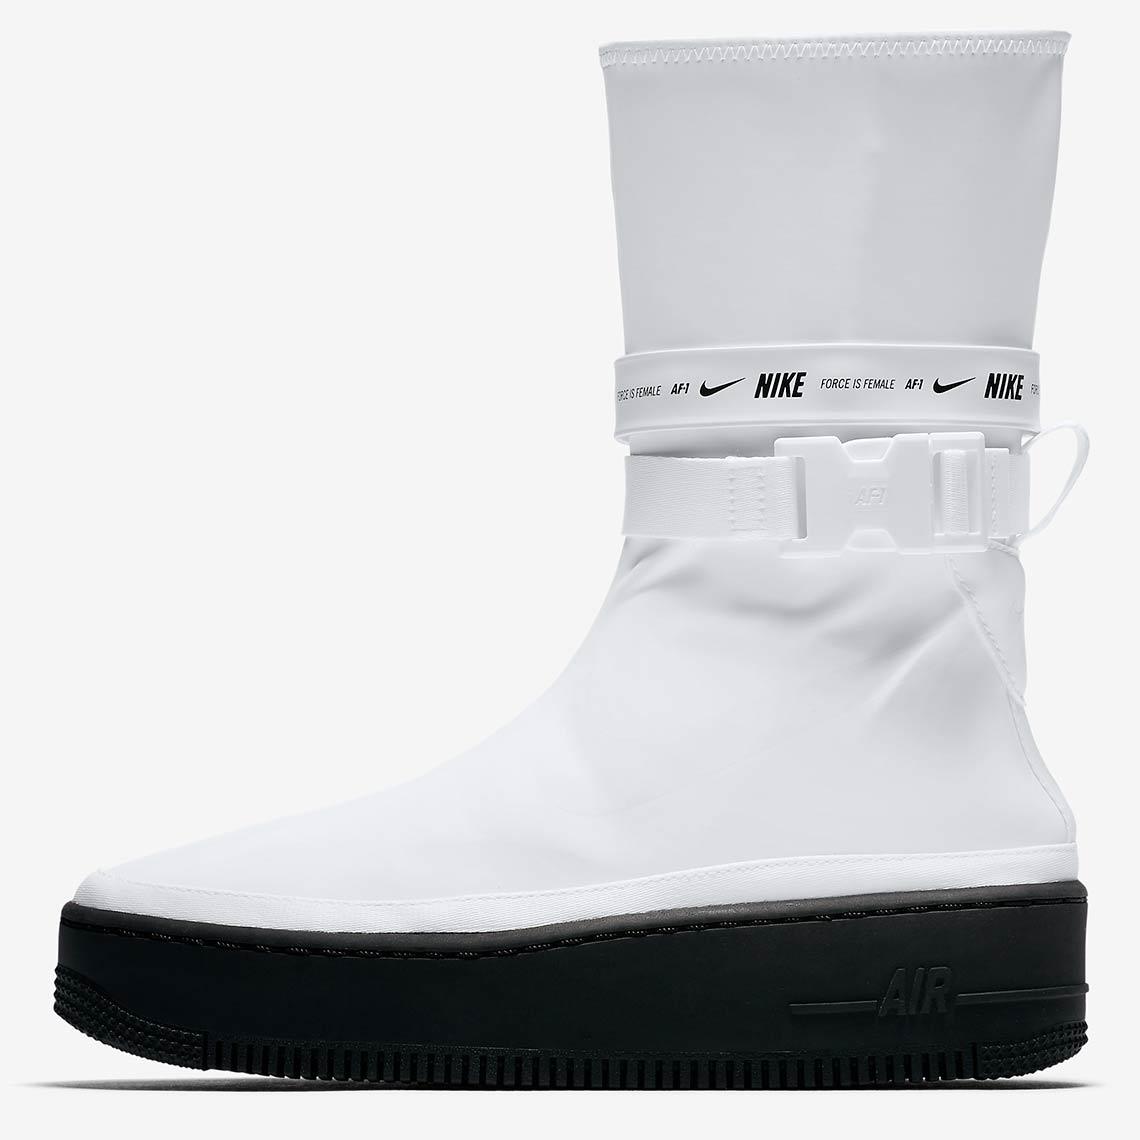 0d9733191d78ca Nike Air Force 1 Sage High Release Date  November 29